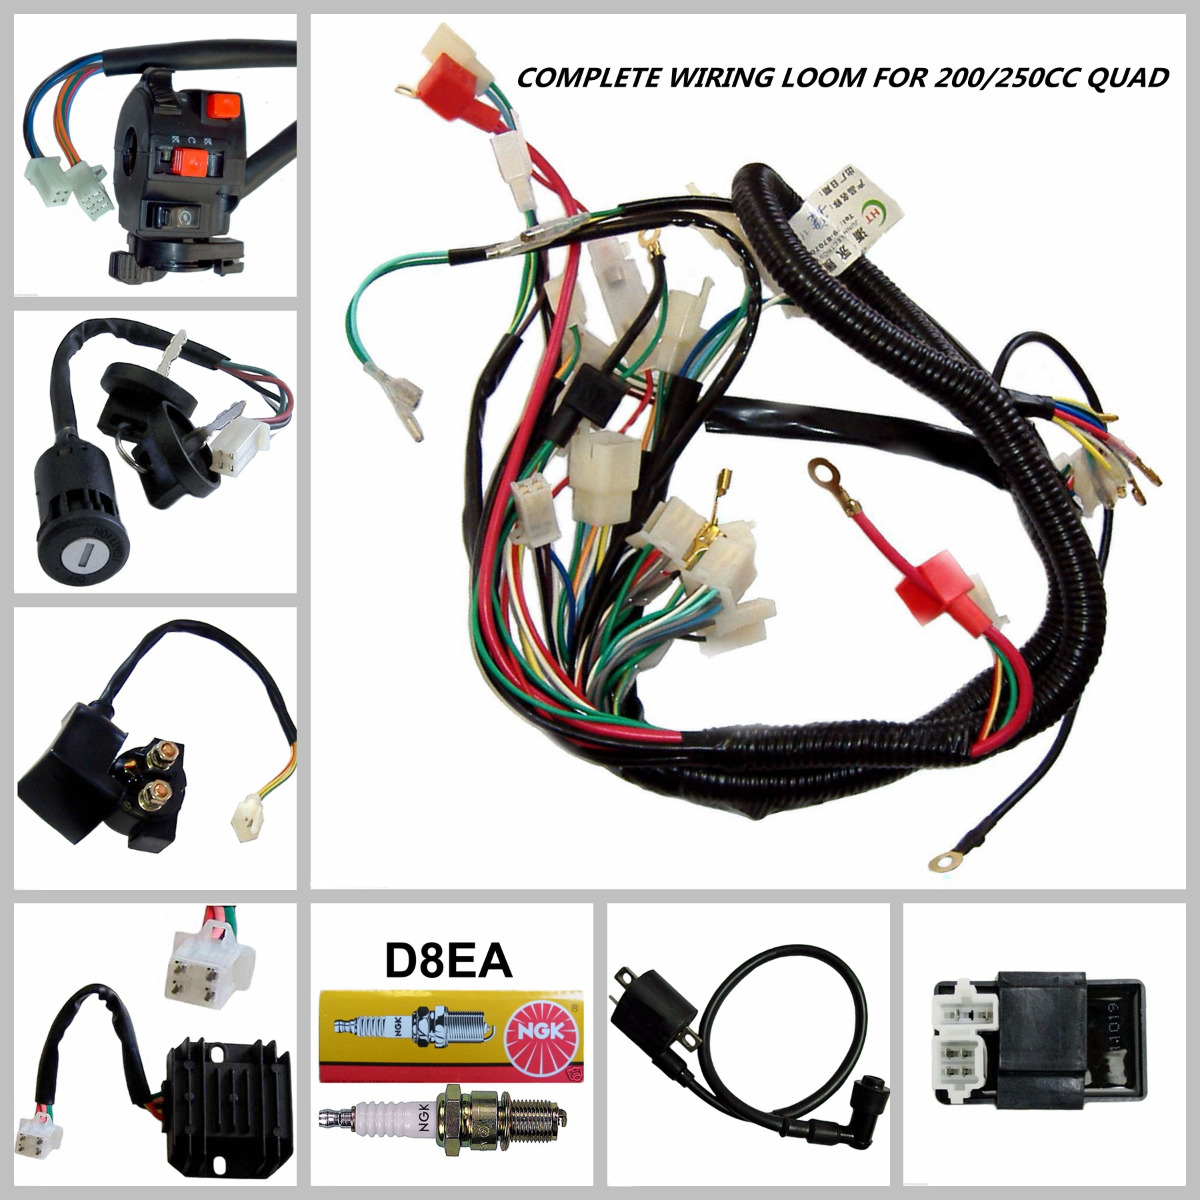 zongshen 250 atv wiring diagram: full electrics wiring harness loom  coil cdi 200/250